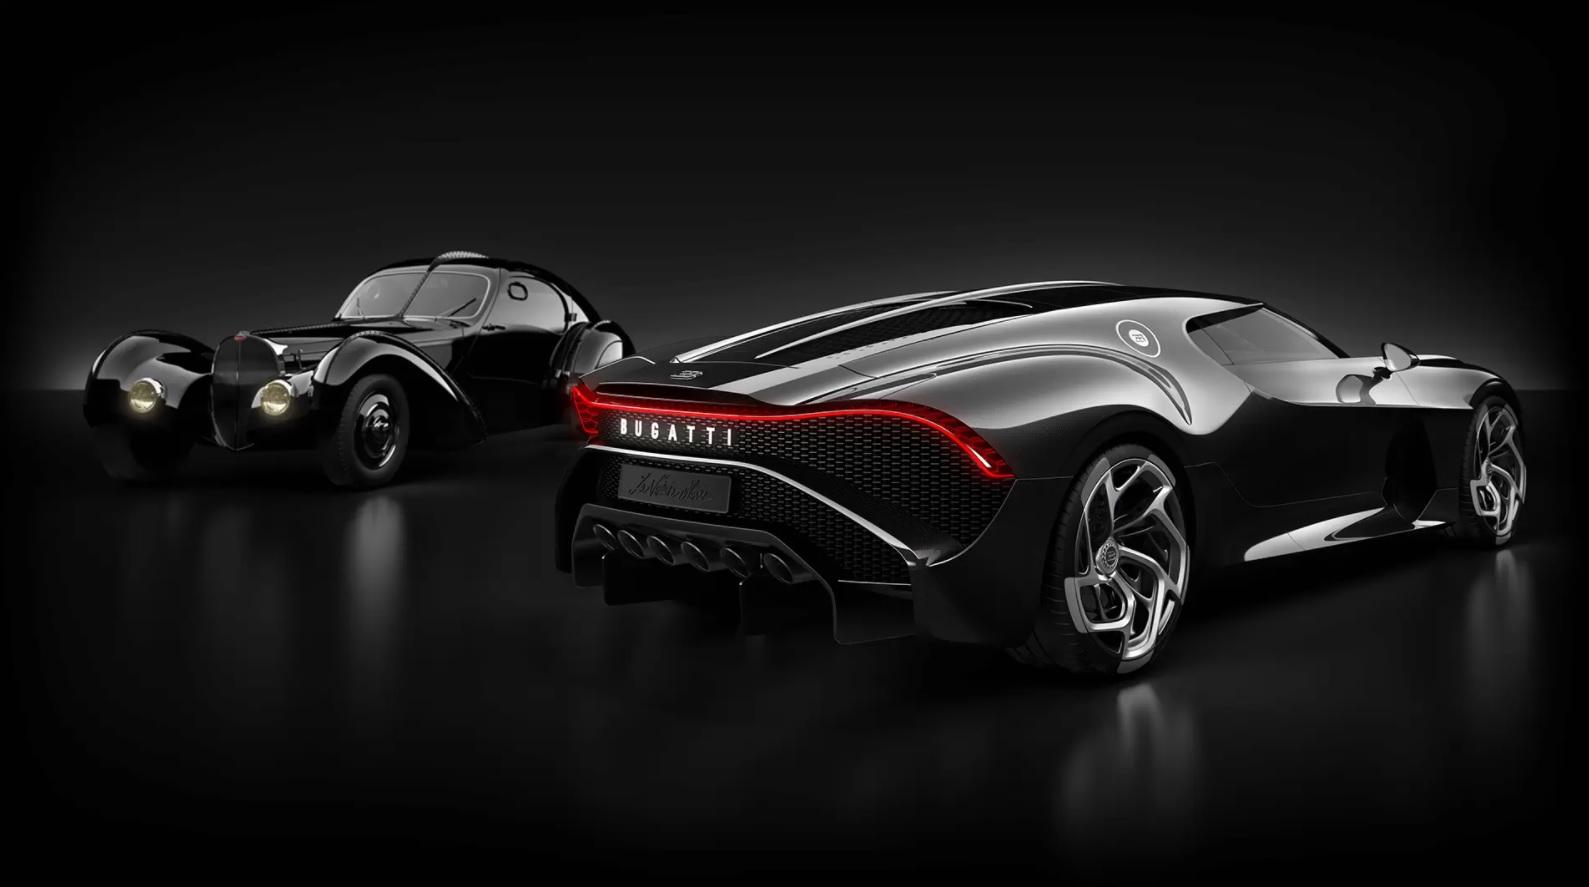 Najdražji avtomobil na svetu je Bugatti La Voiture Noire